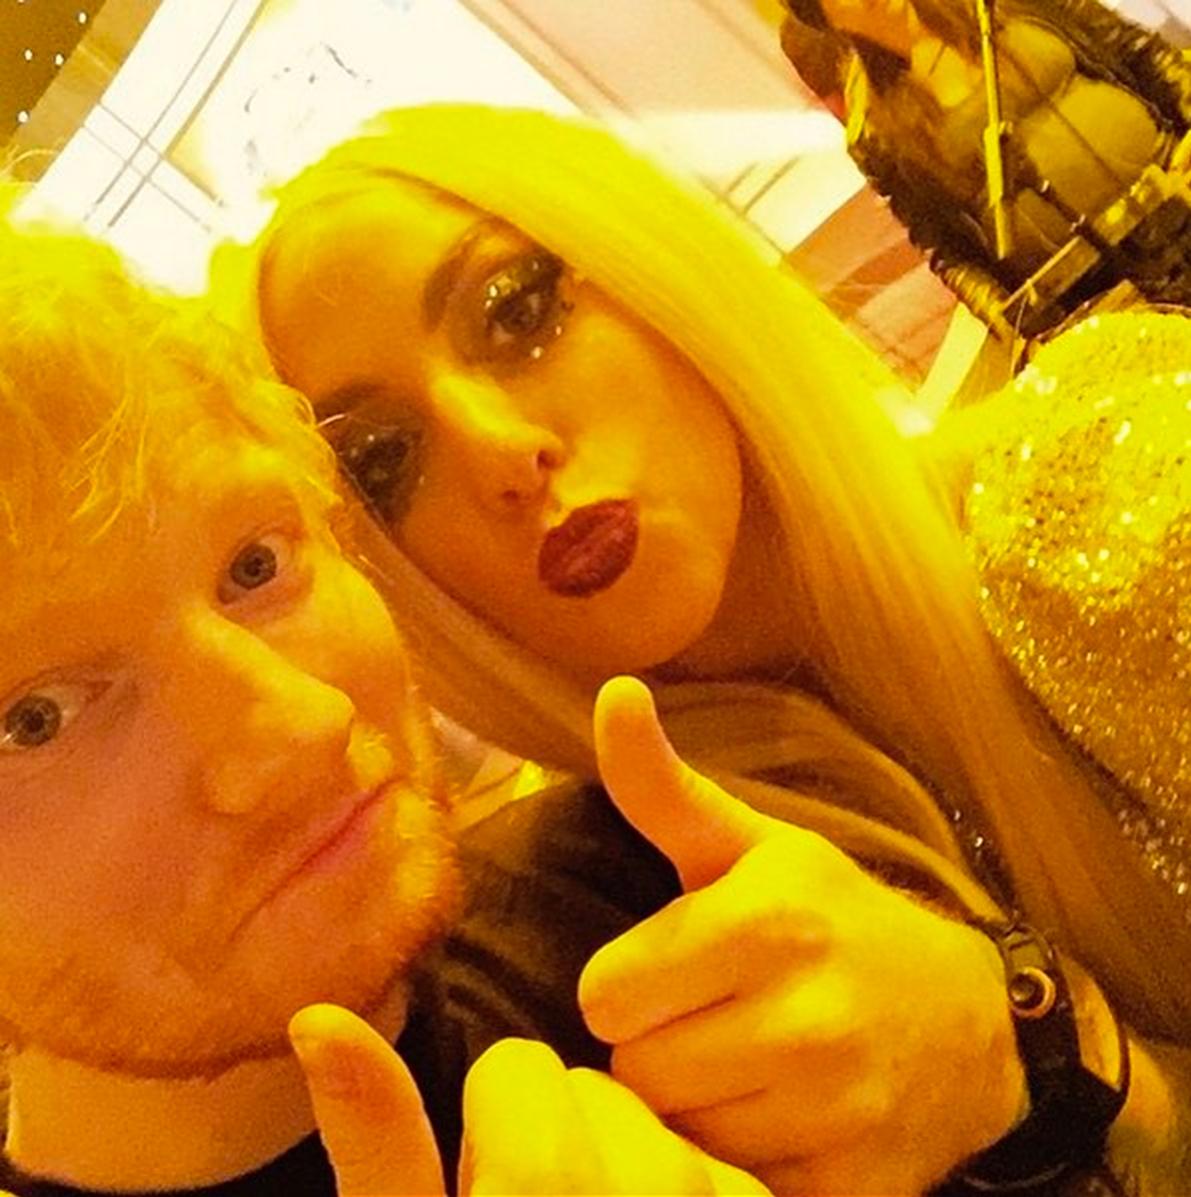 Ed Sheeran Lady Gaga